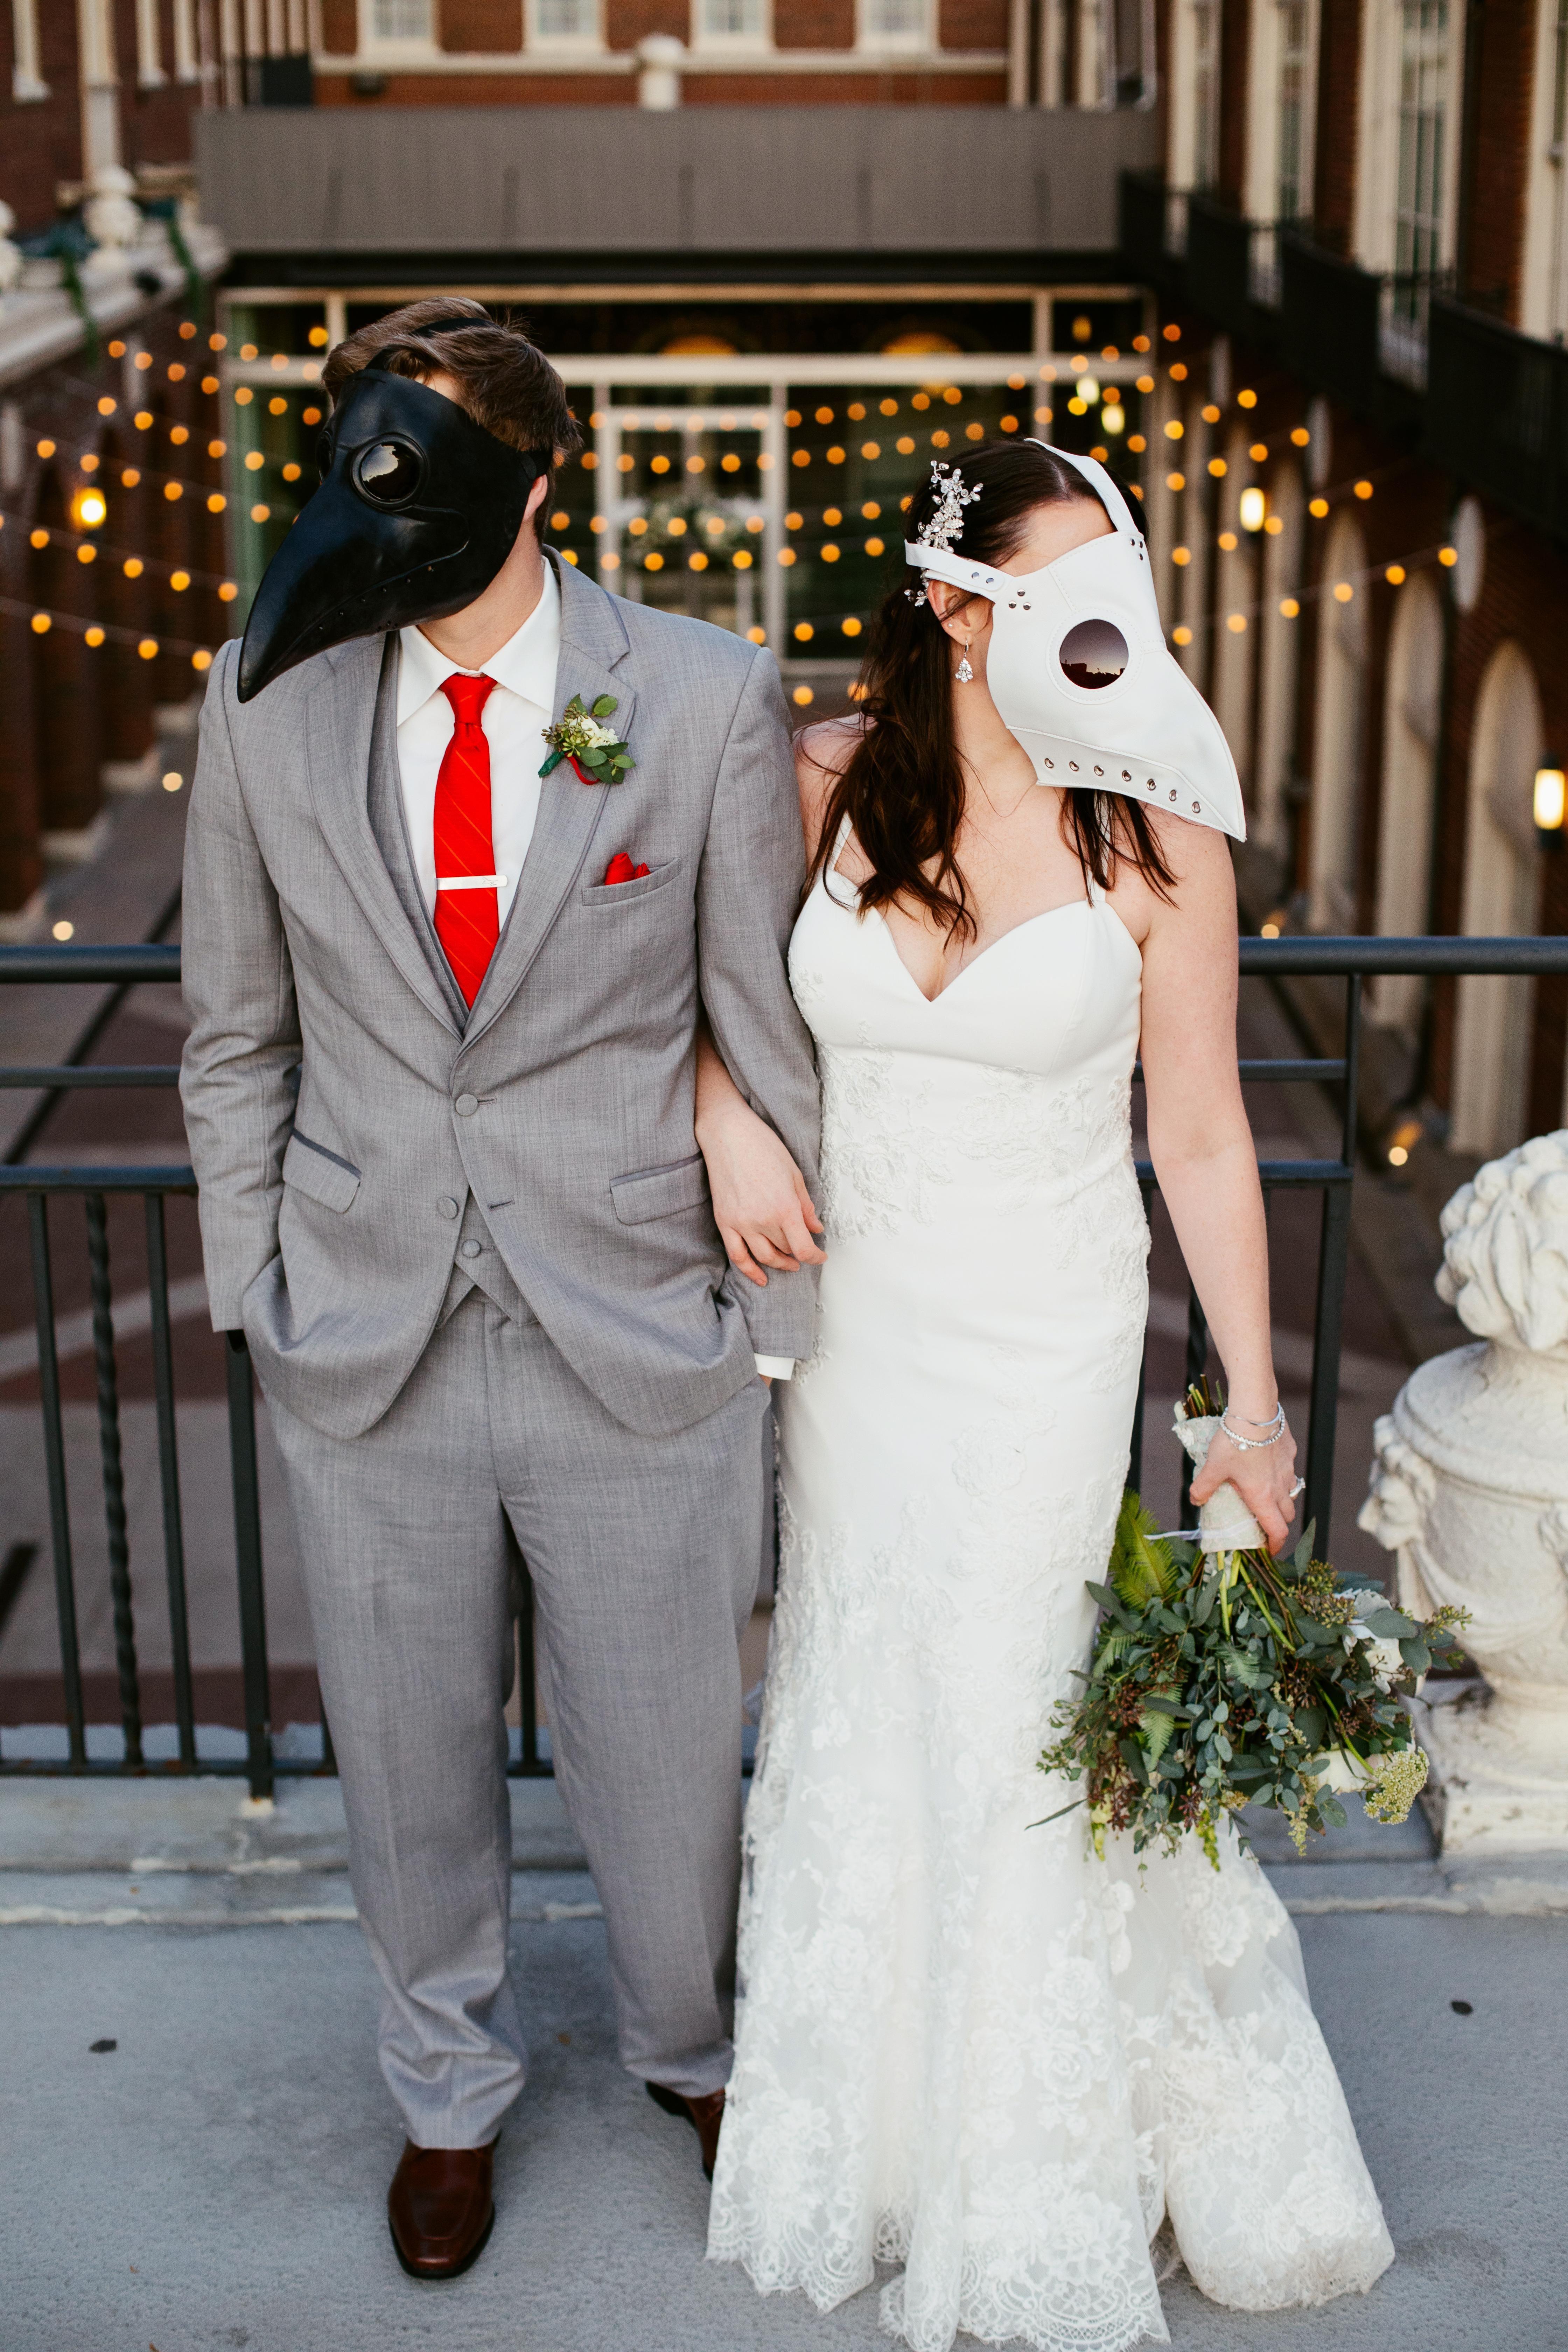 Unique St Louis Wedding Photography In 2020 Wedding Photography St Louis Wedding St Louis Wedding Photography